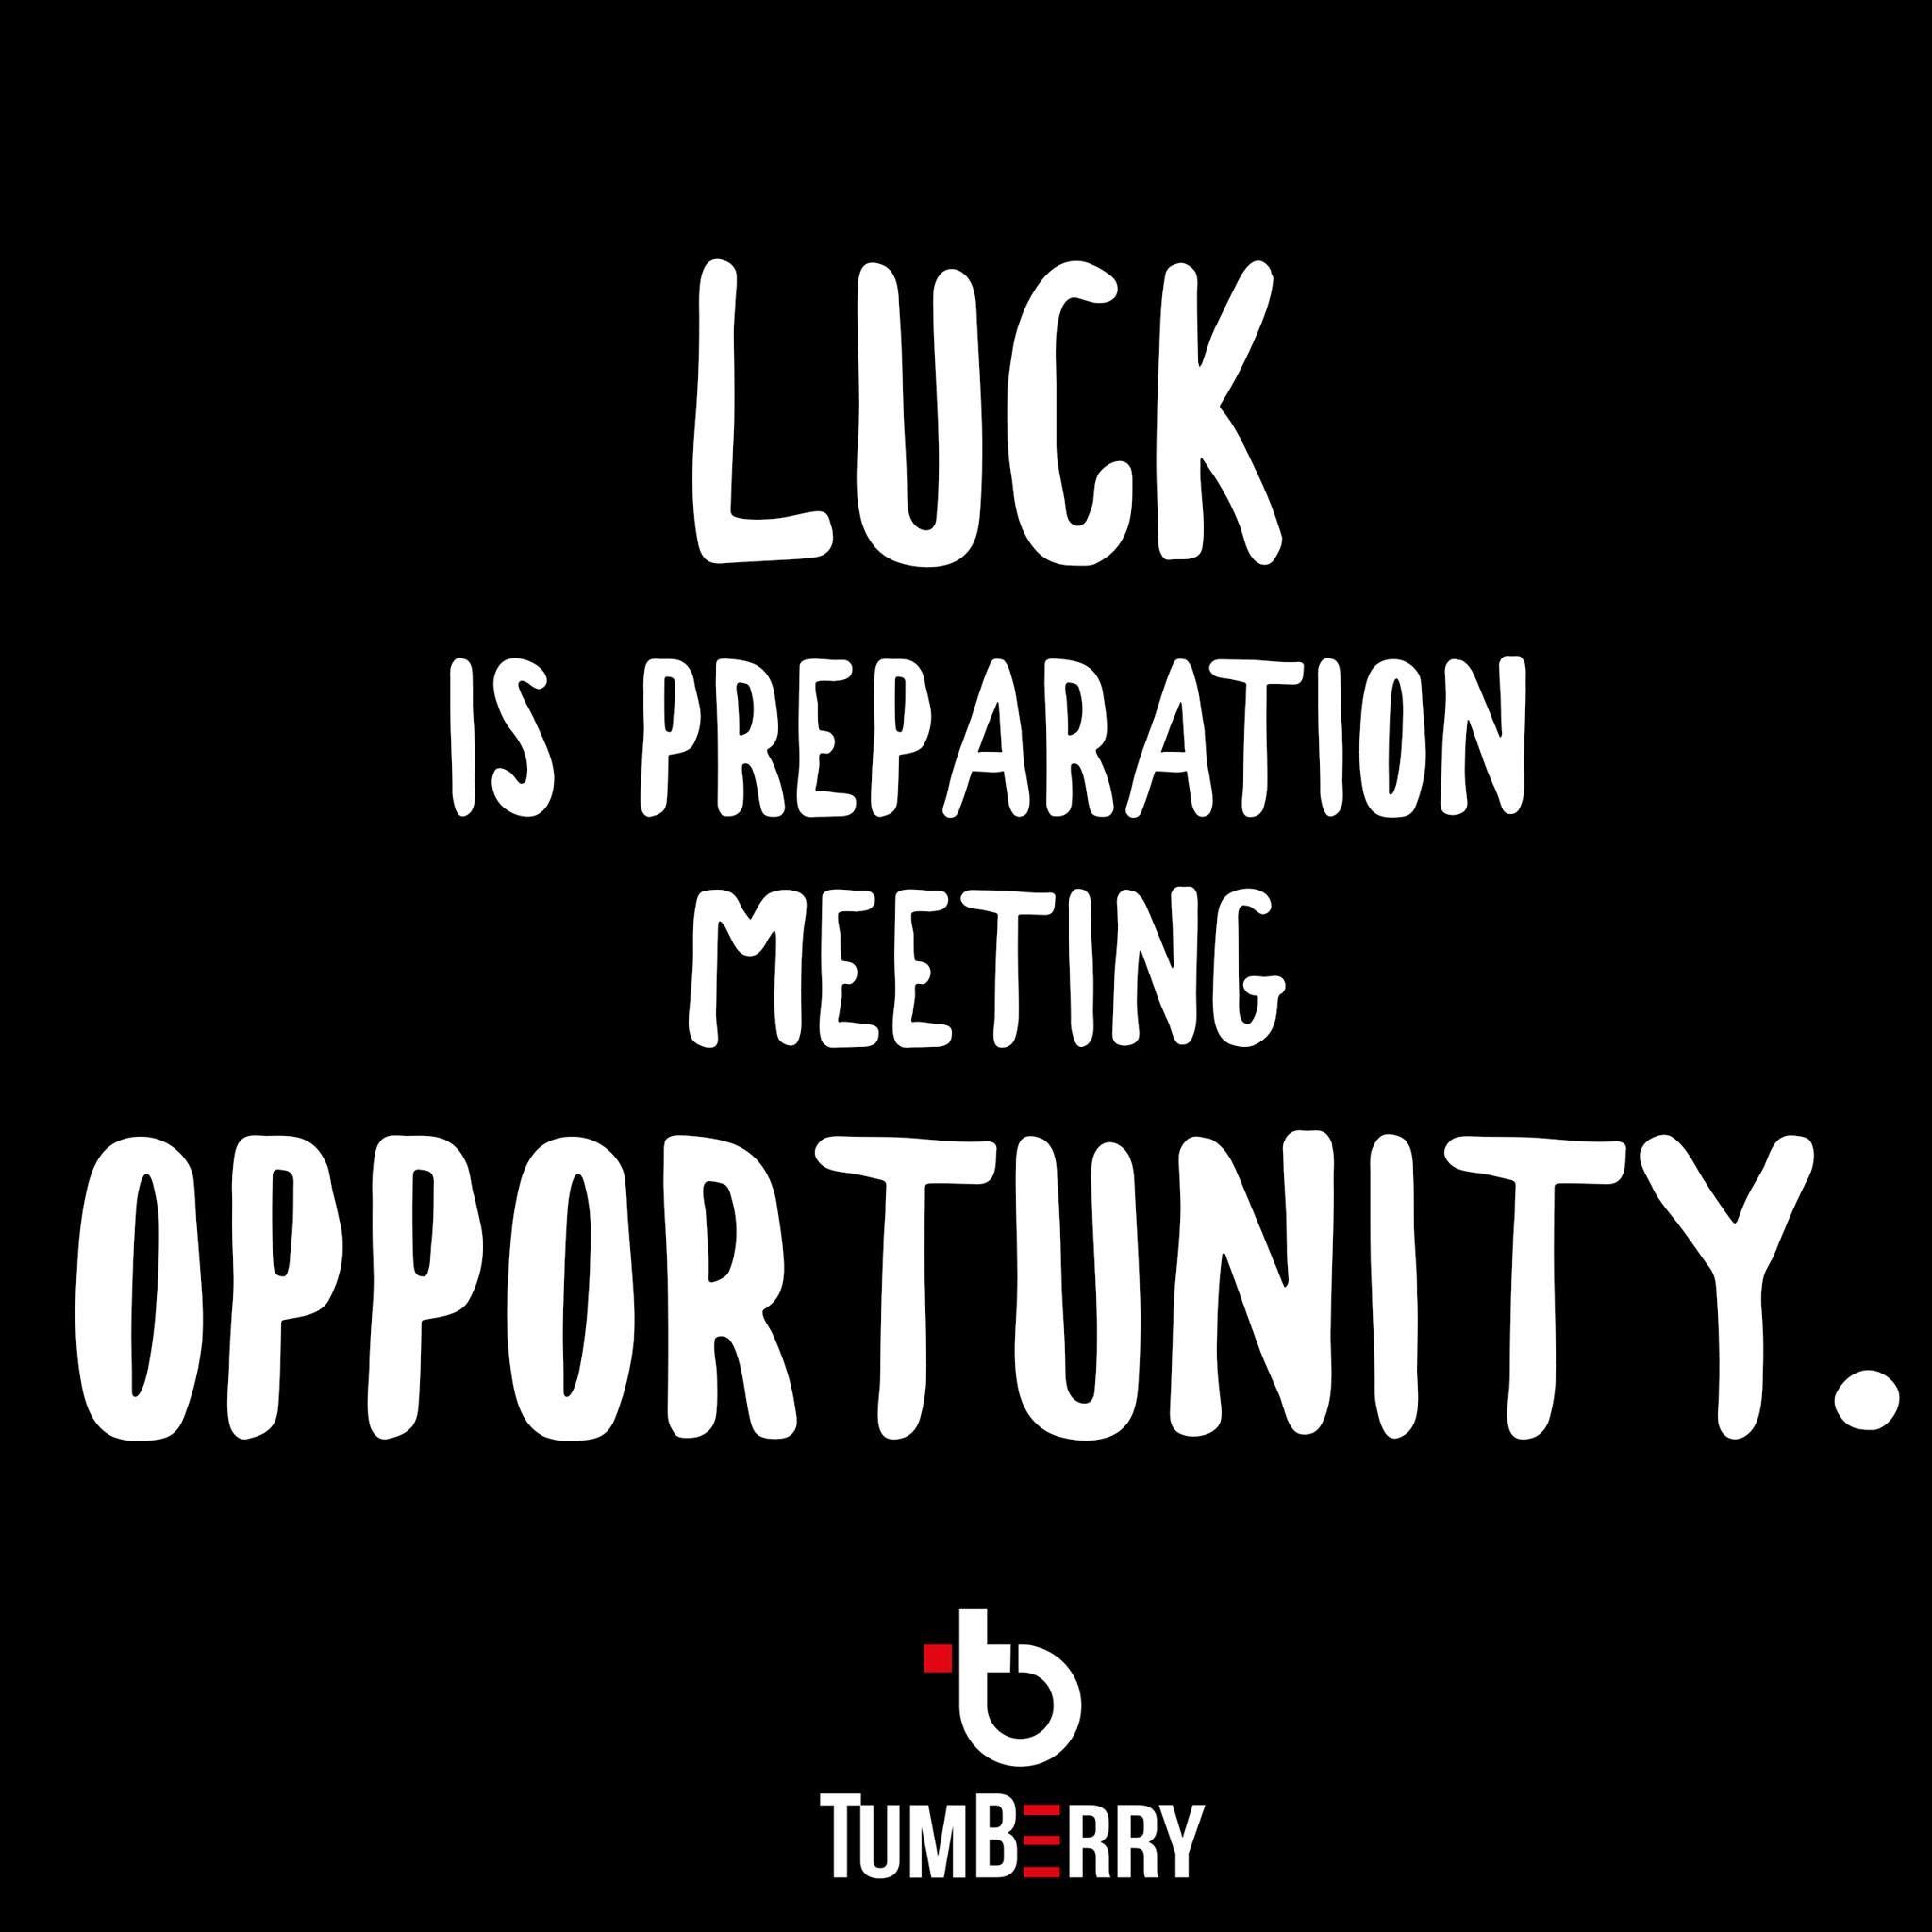 Jiu Jitsu Quotes Tumberry Kimonos Luck Is Preparation Meeting Opportunityjiu